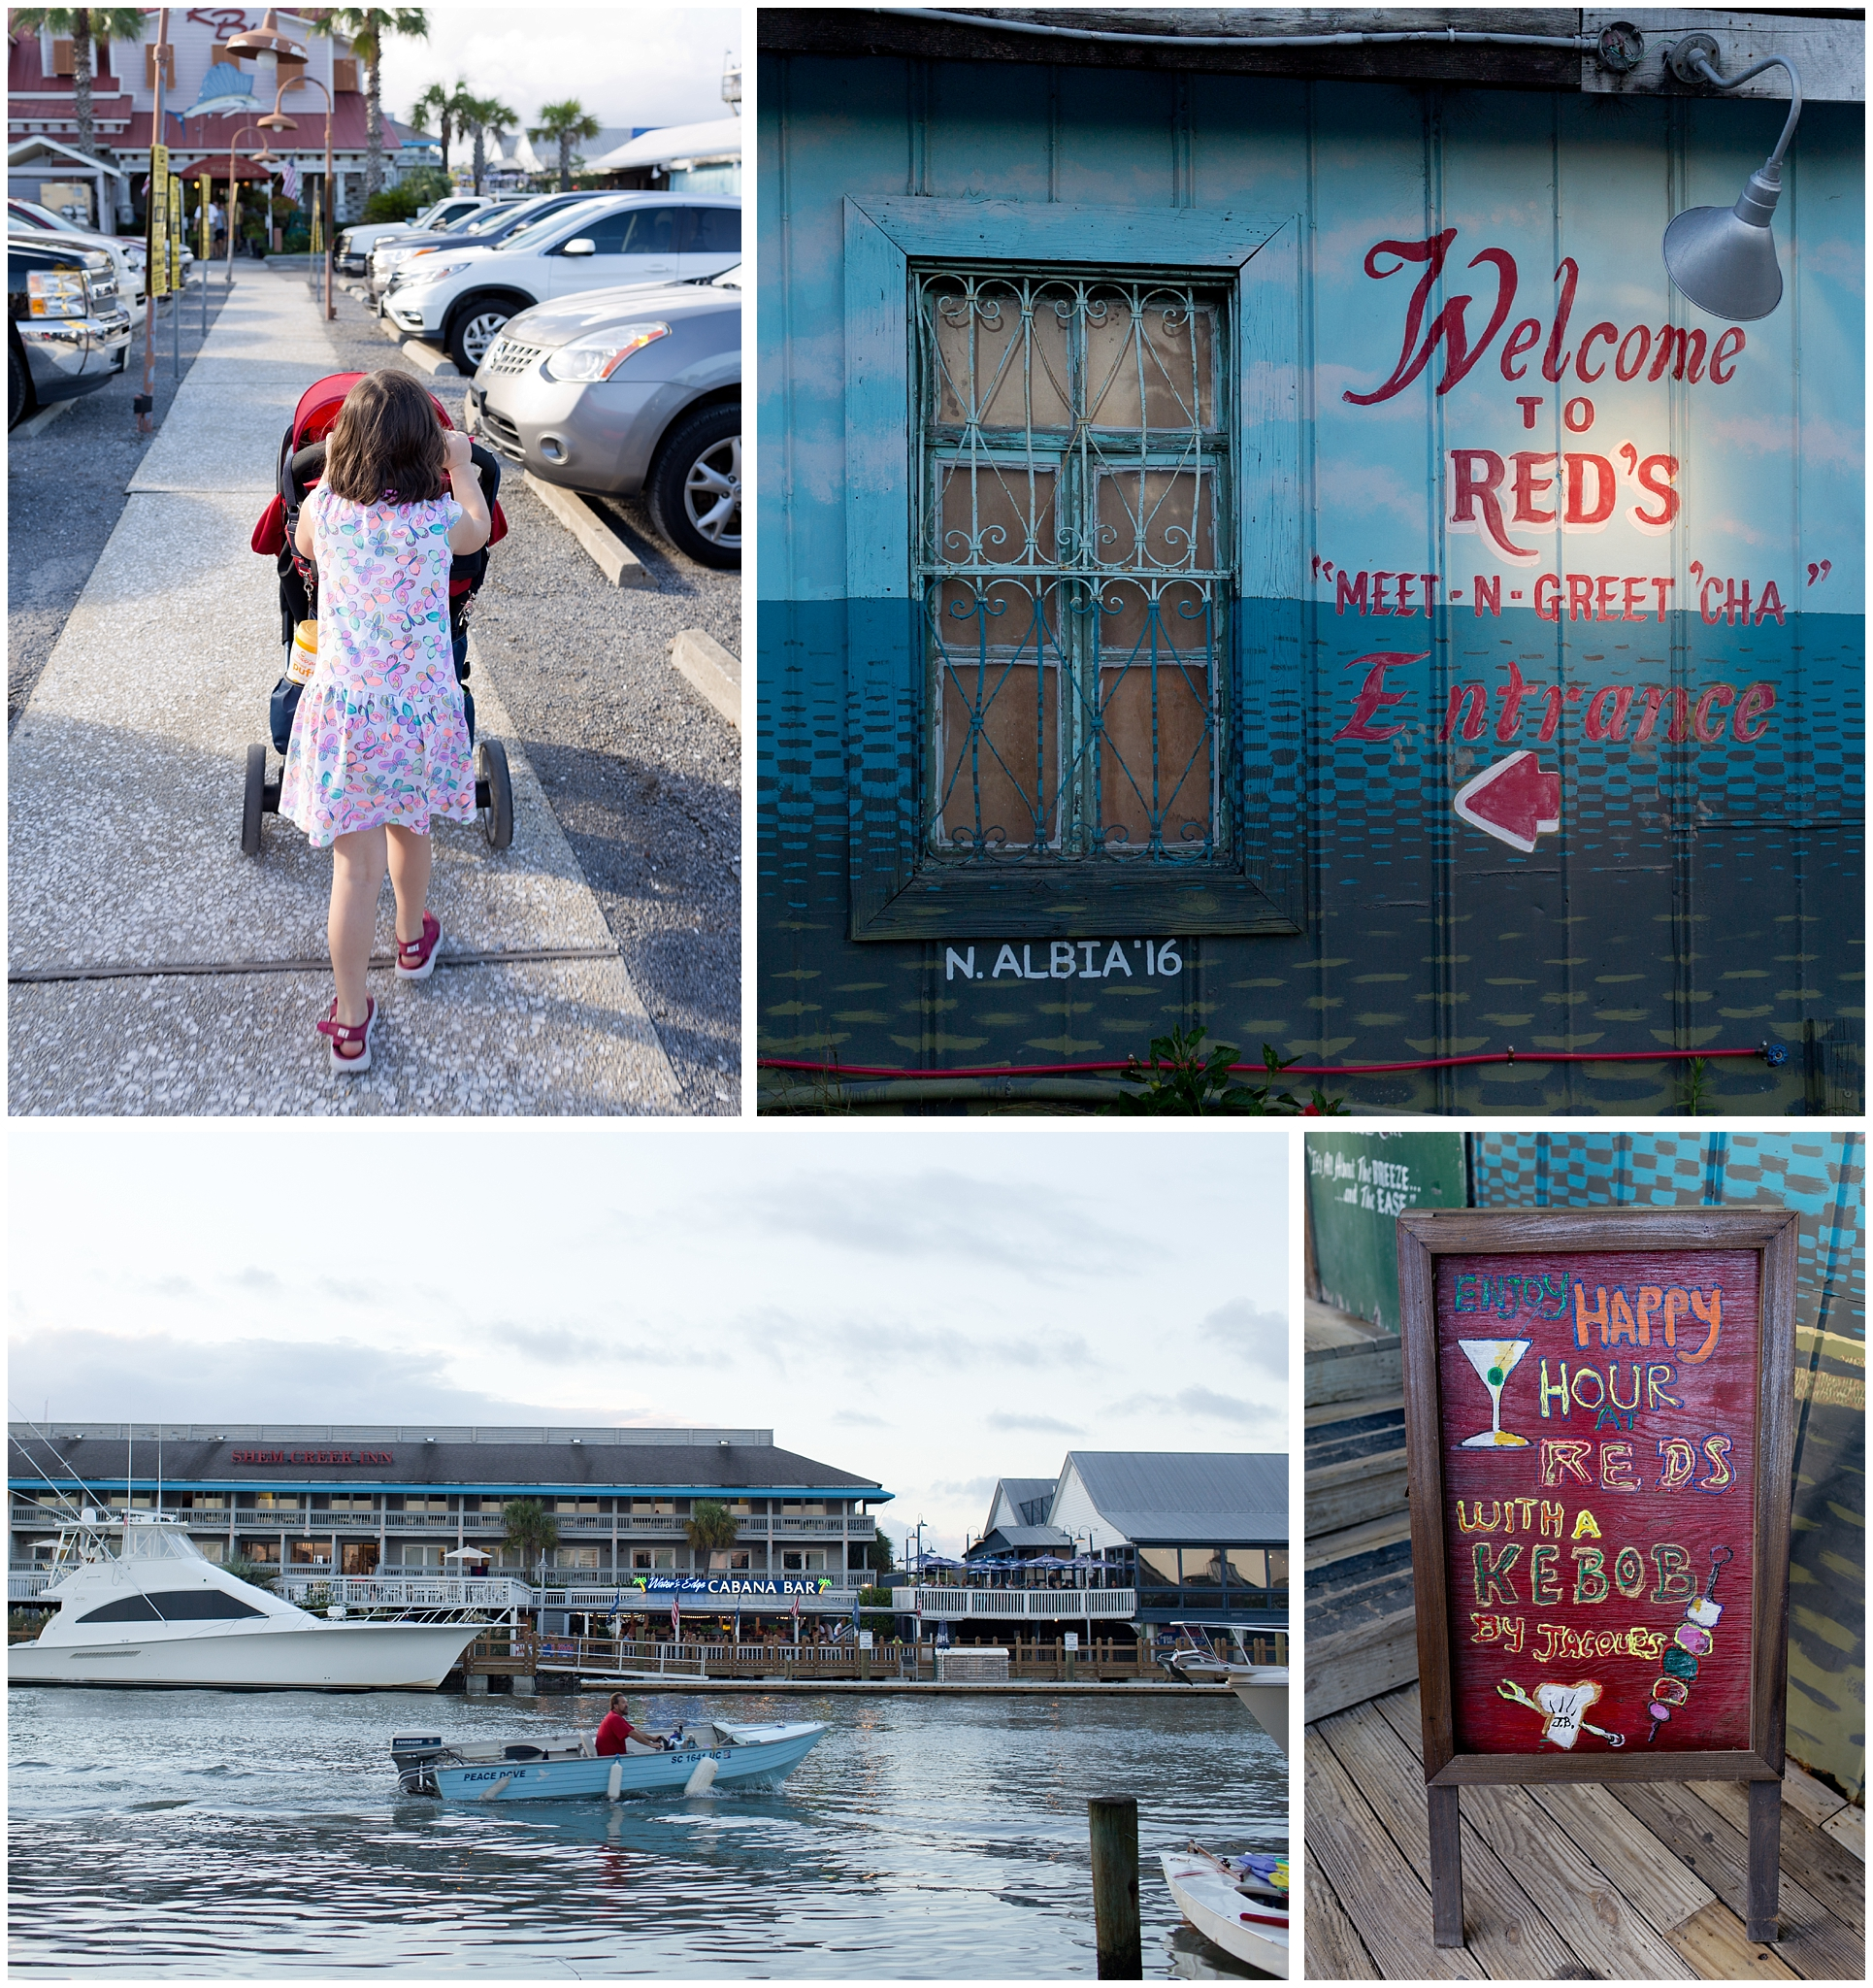 Red's Restaurant in Charleston, SC